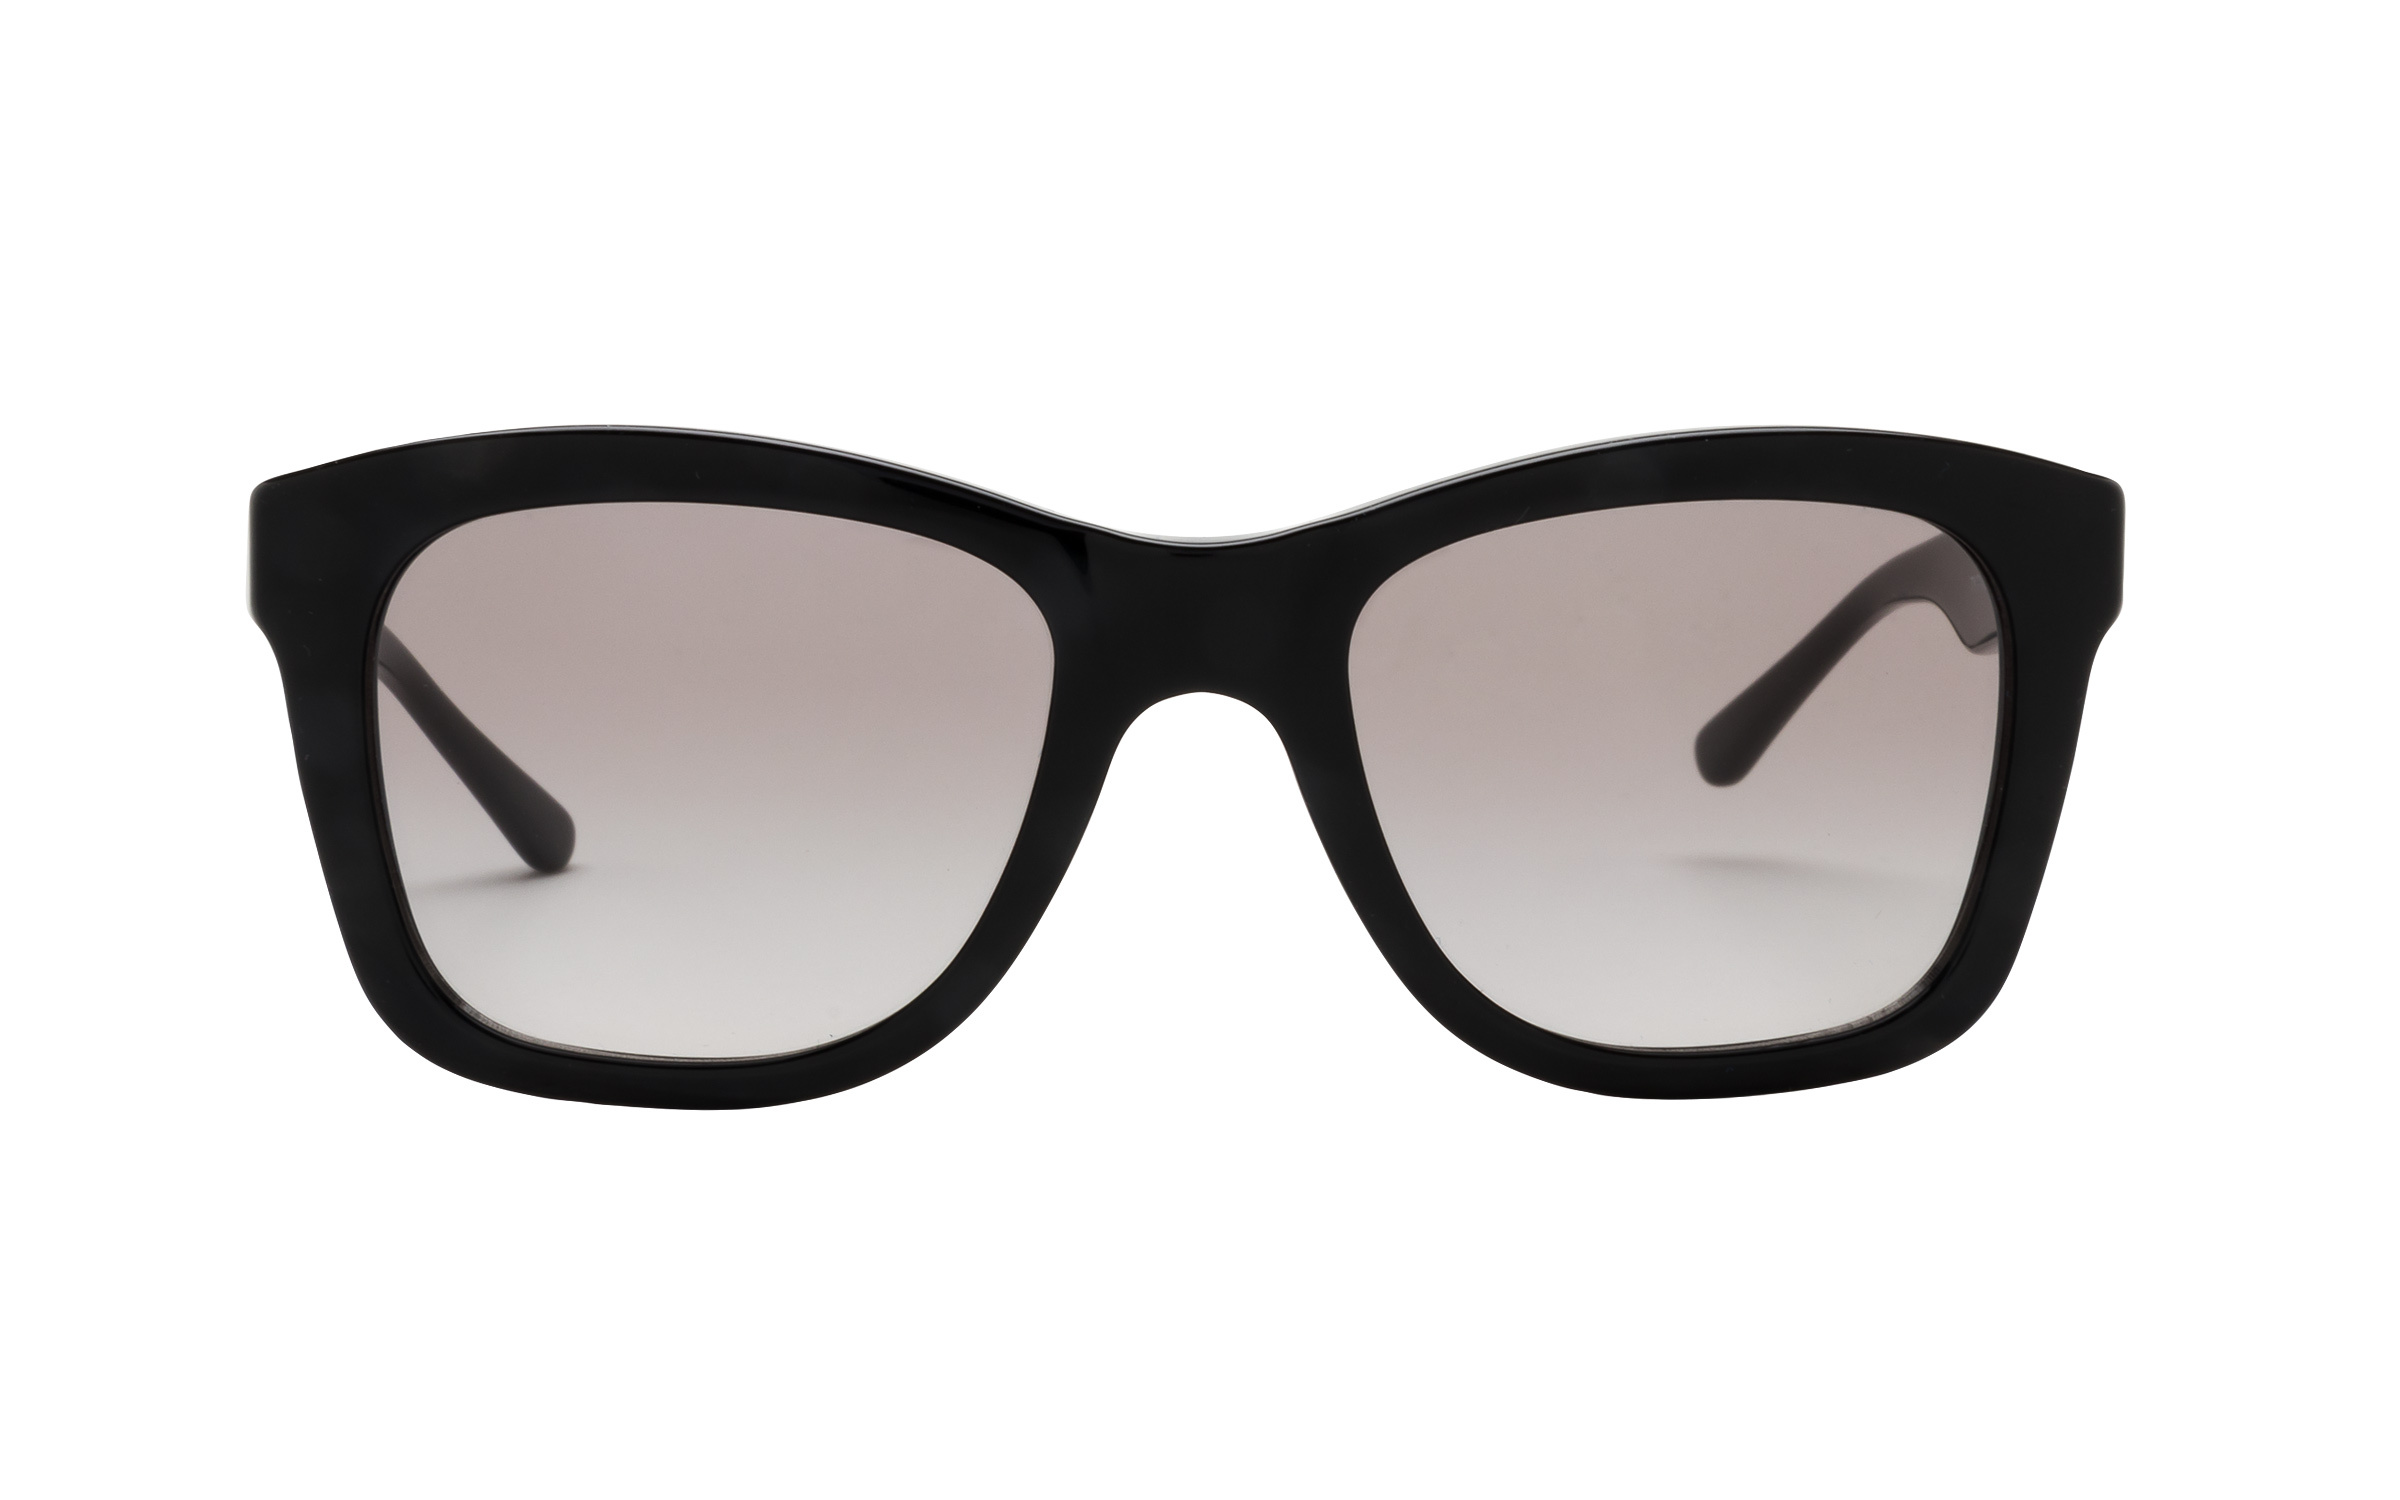 http://www.coastal.com/ - Luxottica Tory Burch TY7118 1709/11 52 Sunglasses in Black – Online Coastal